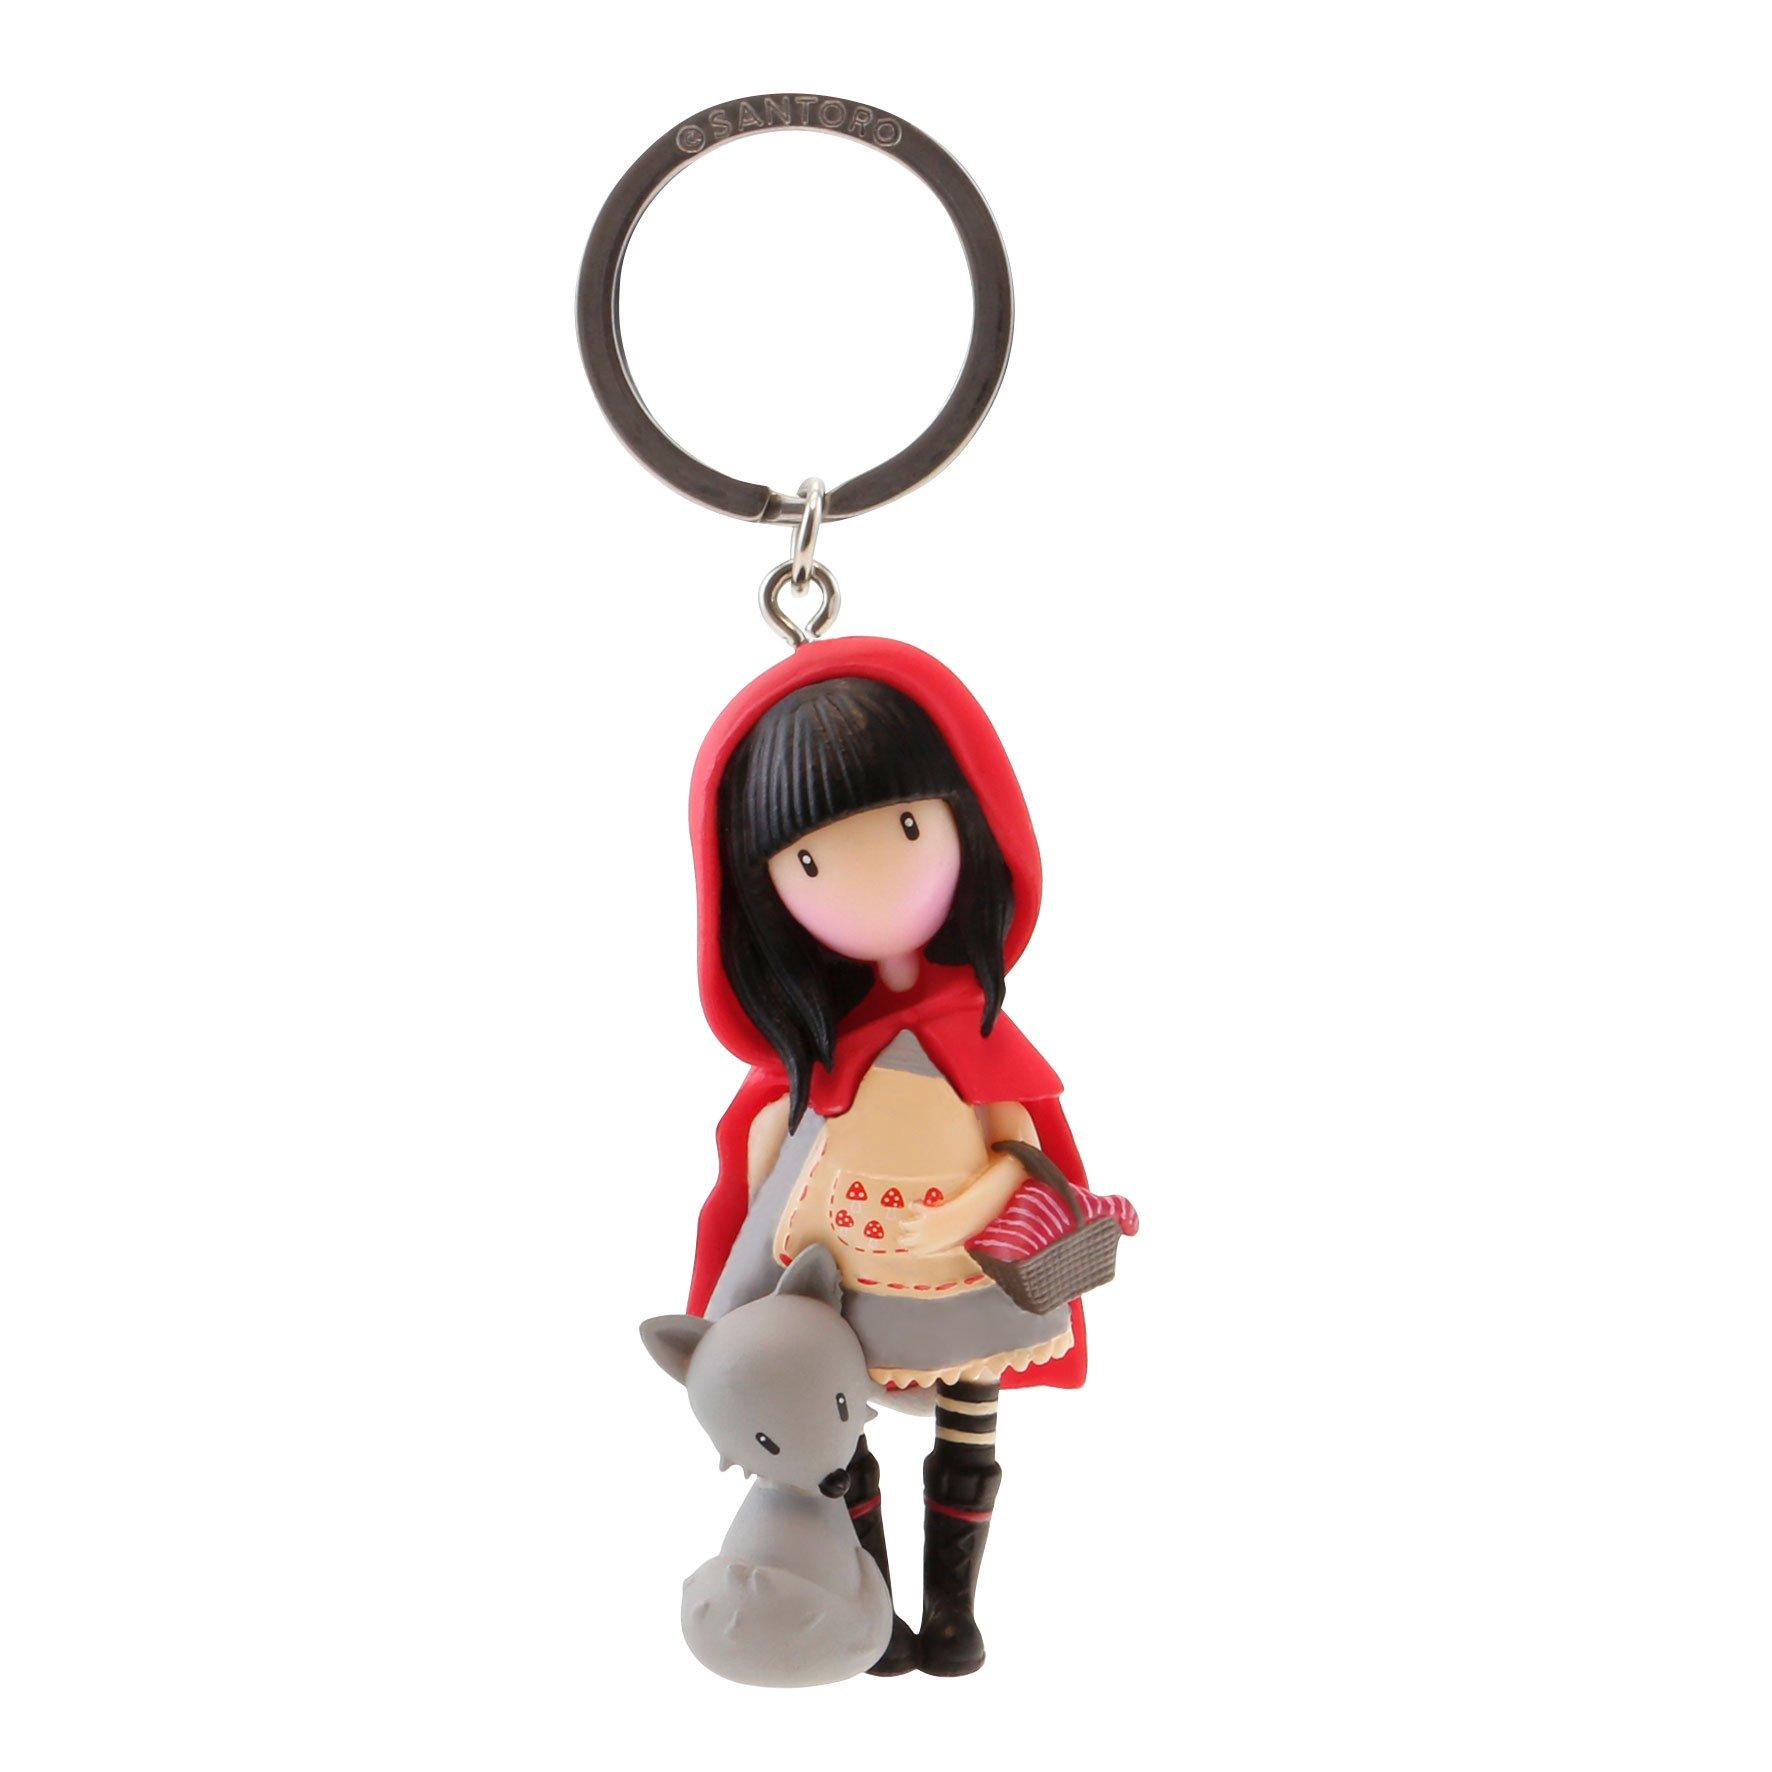 bb7095b539b2 Porte clé Gorjuss figurine Little red riding hood product image